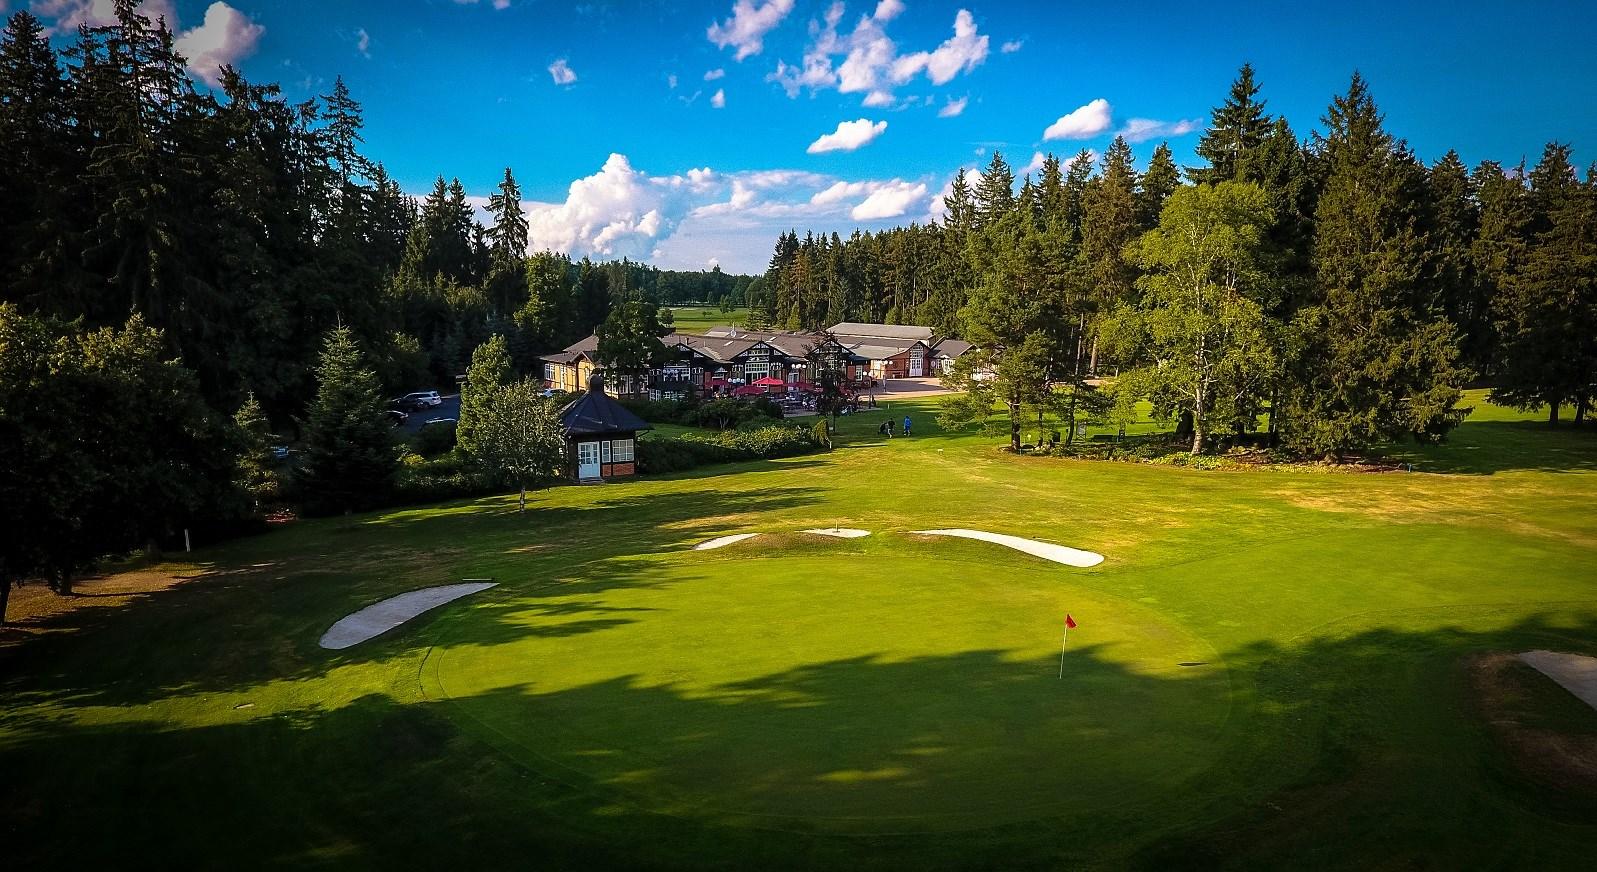 Golf_Marianske_Lazne_02.jpg